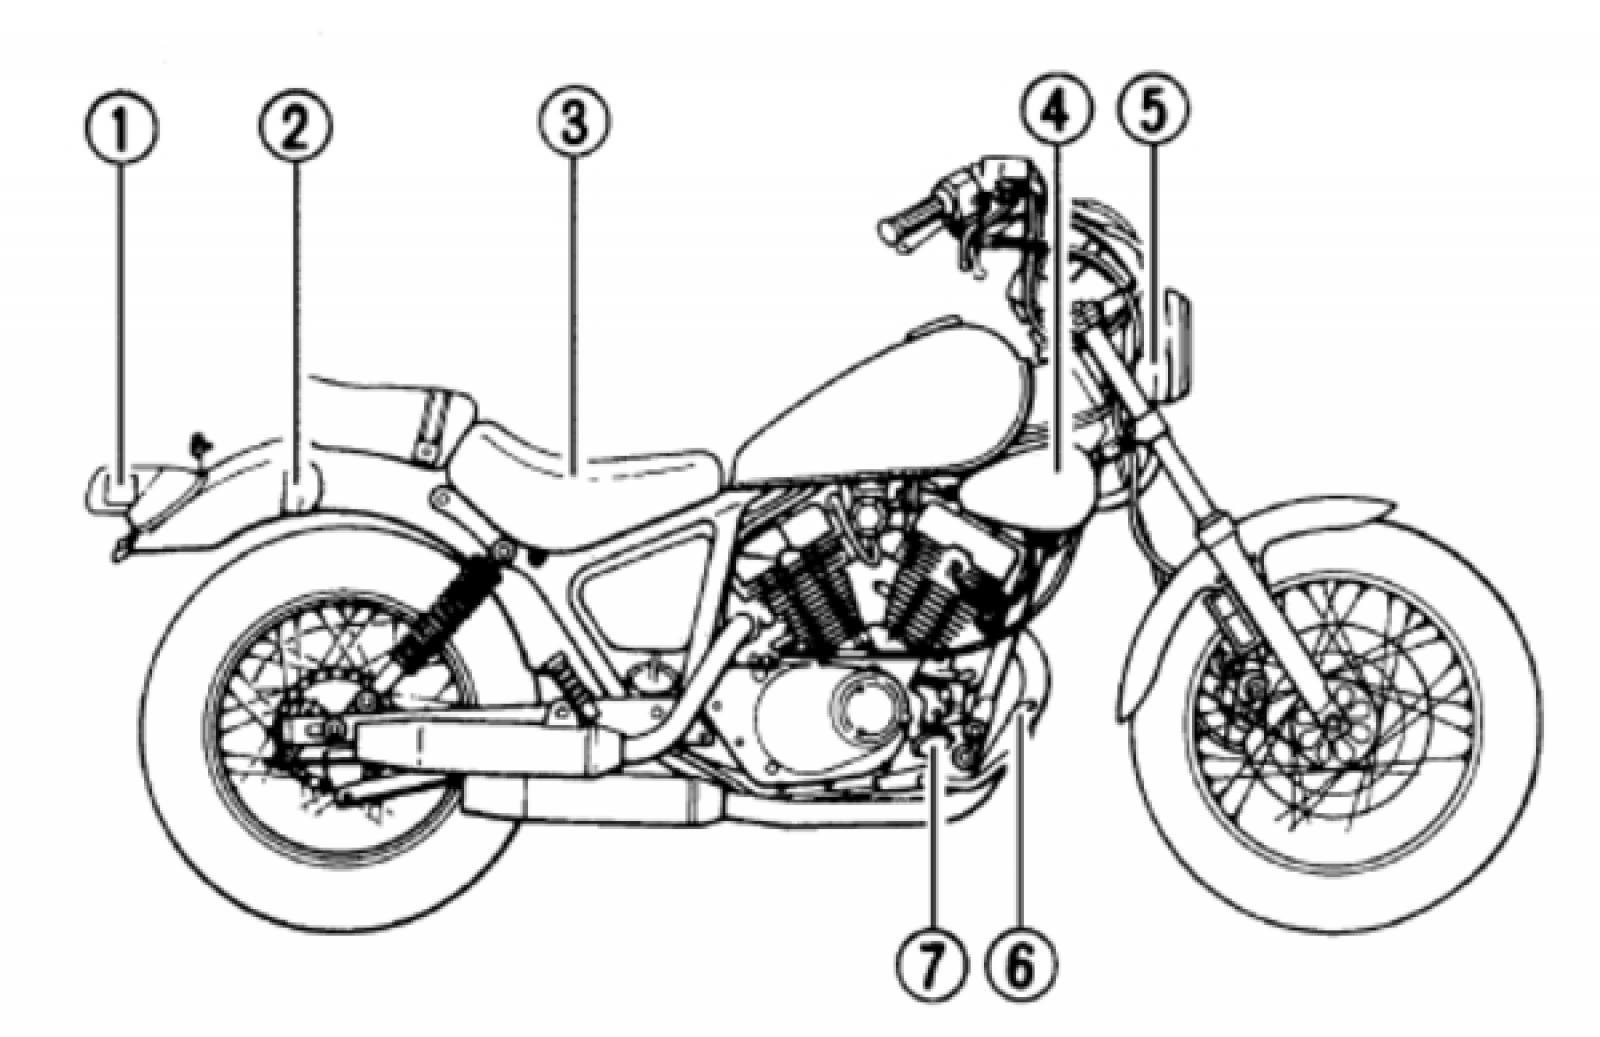 virago 250 wiring diagram eye lens ray 2000 yamaha v twin 6 wire 37